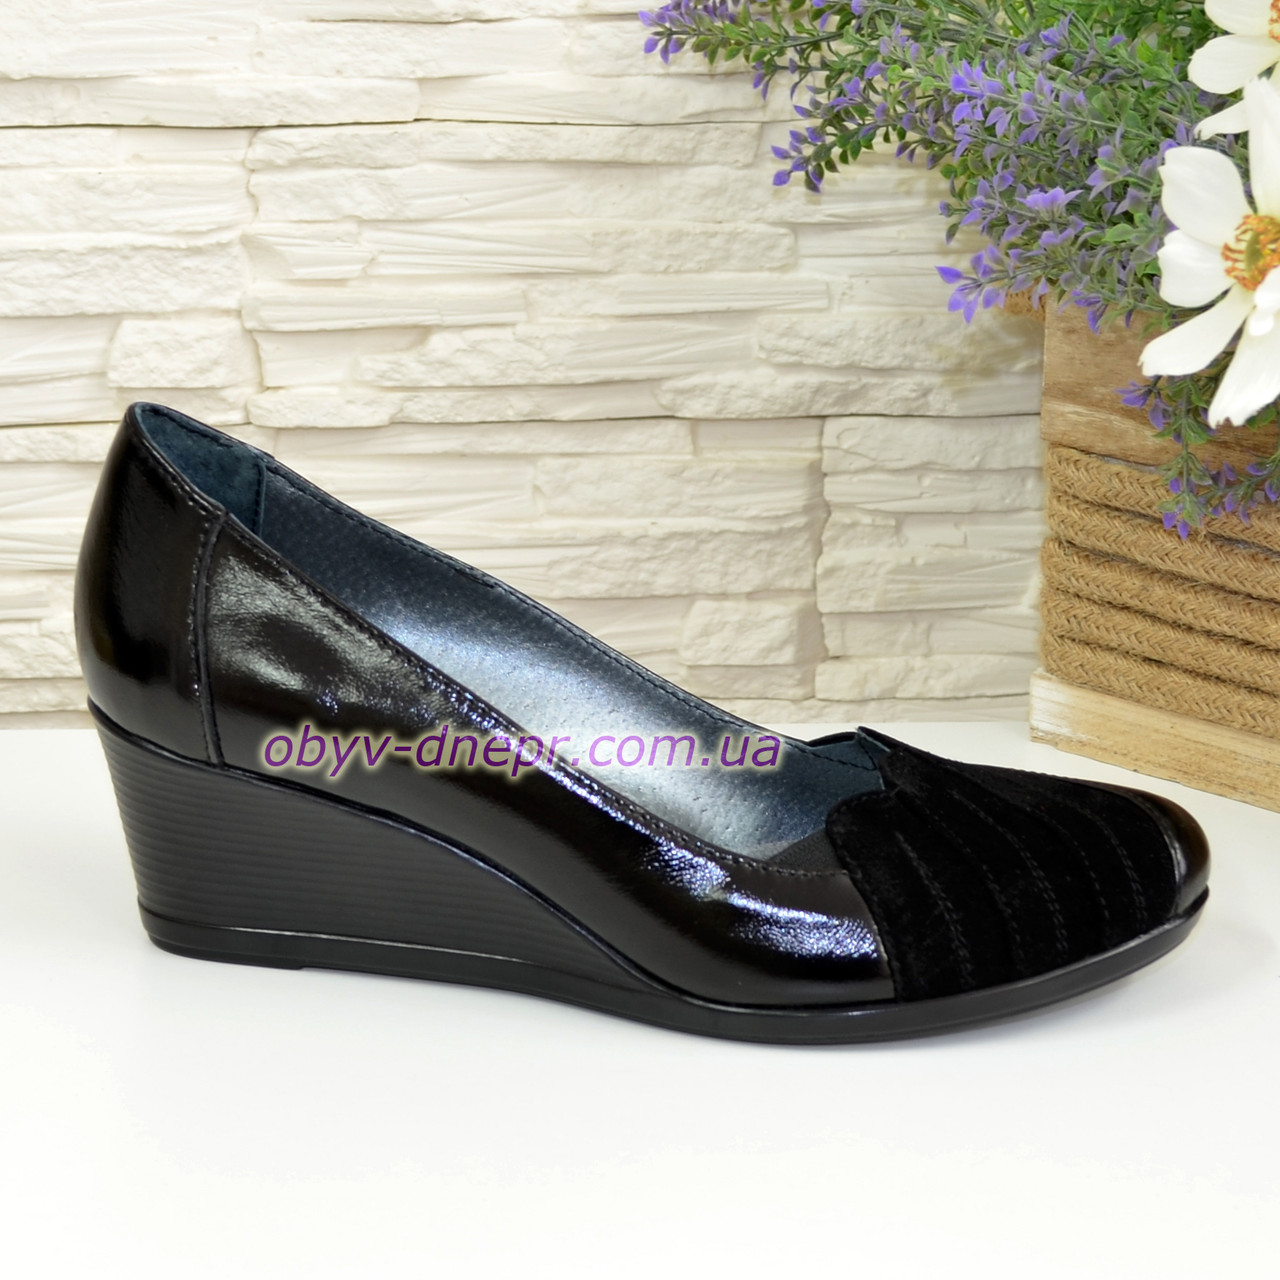 Жіночі чорні туфлі на танкетці, натуральна лакова шкіра і замша